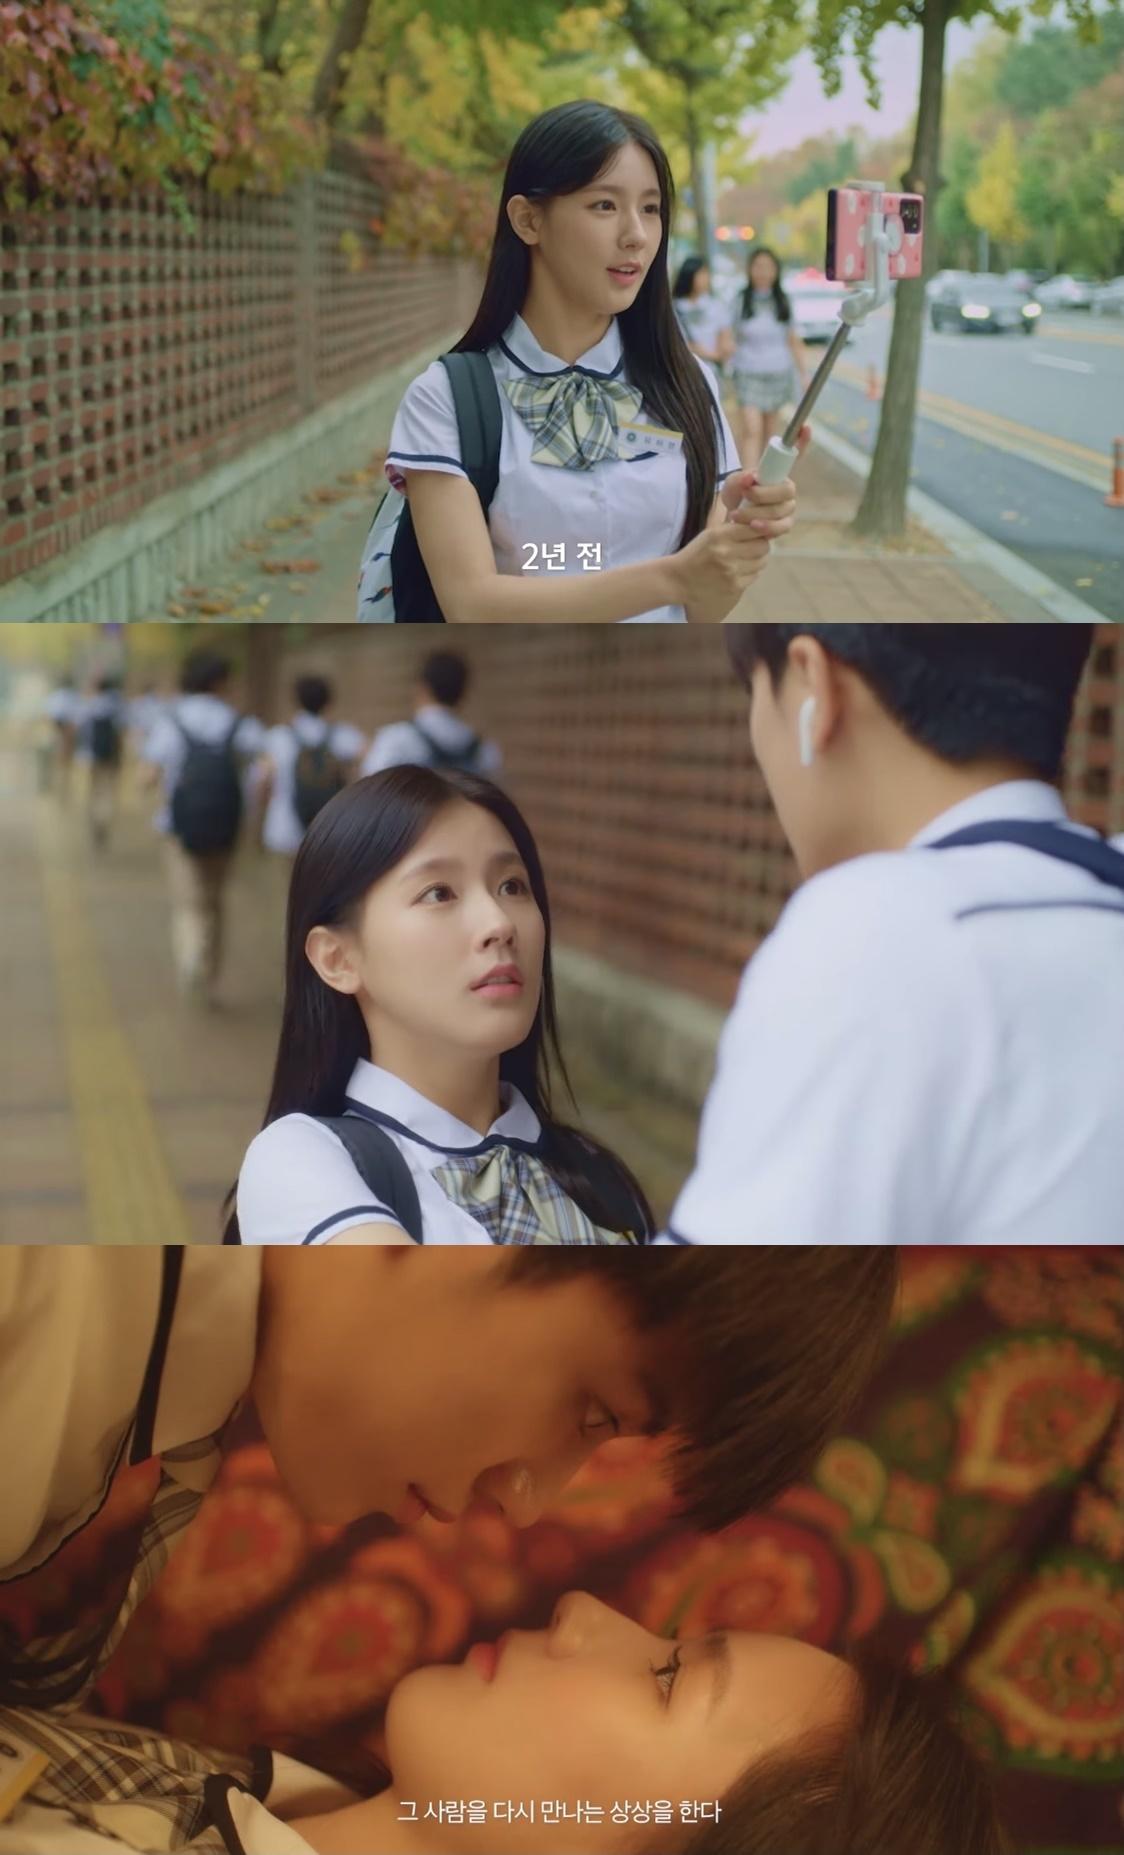 Replay: The Moment (리플레이: 다시 시작되는 순간) OST PLAYLIST - YouTube